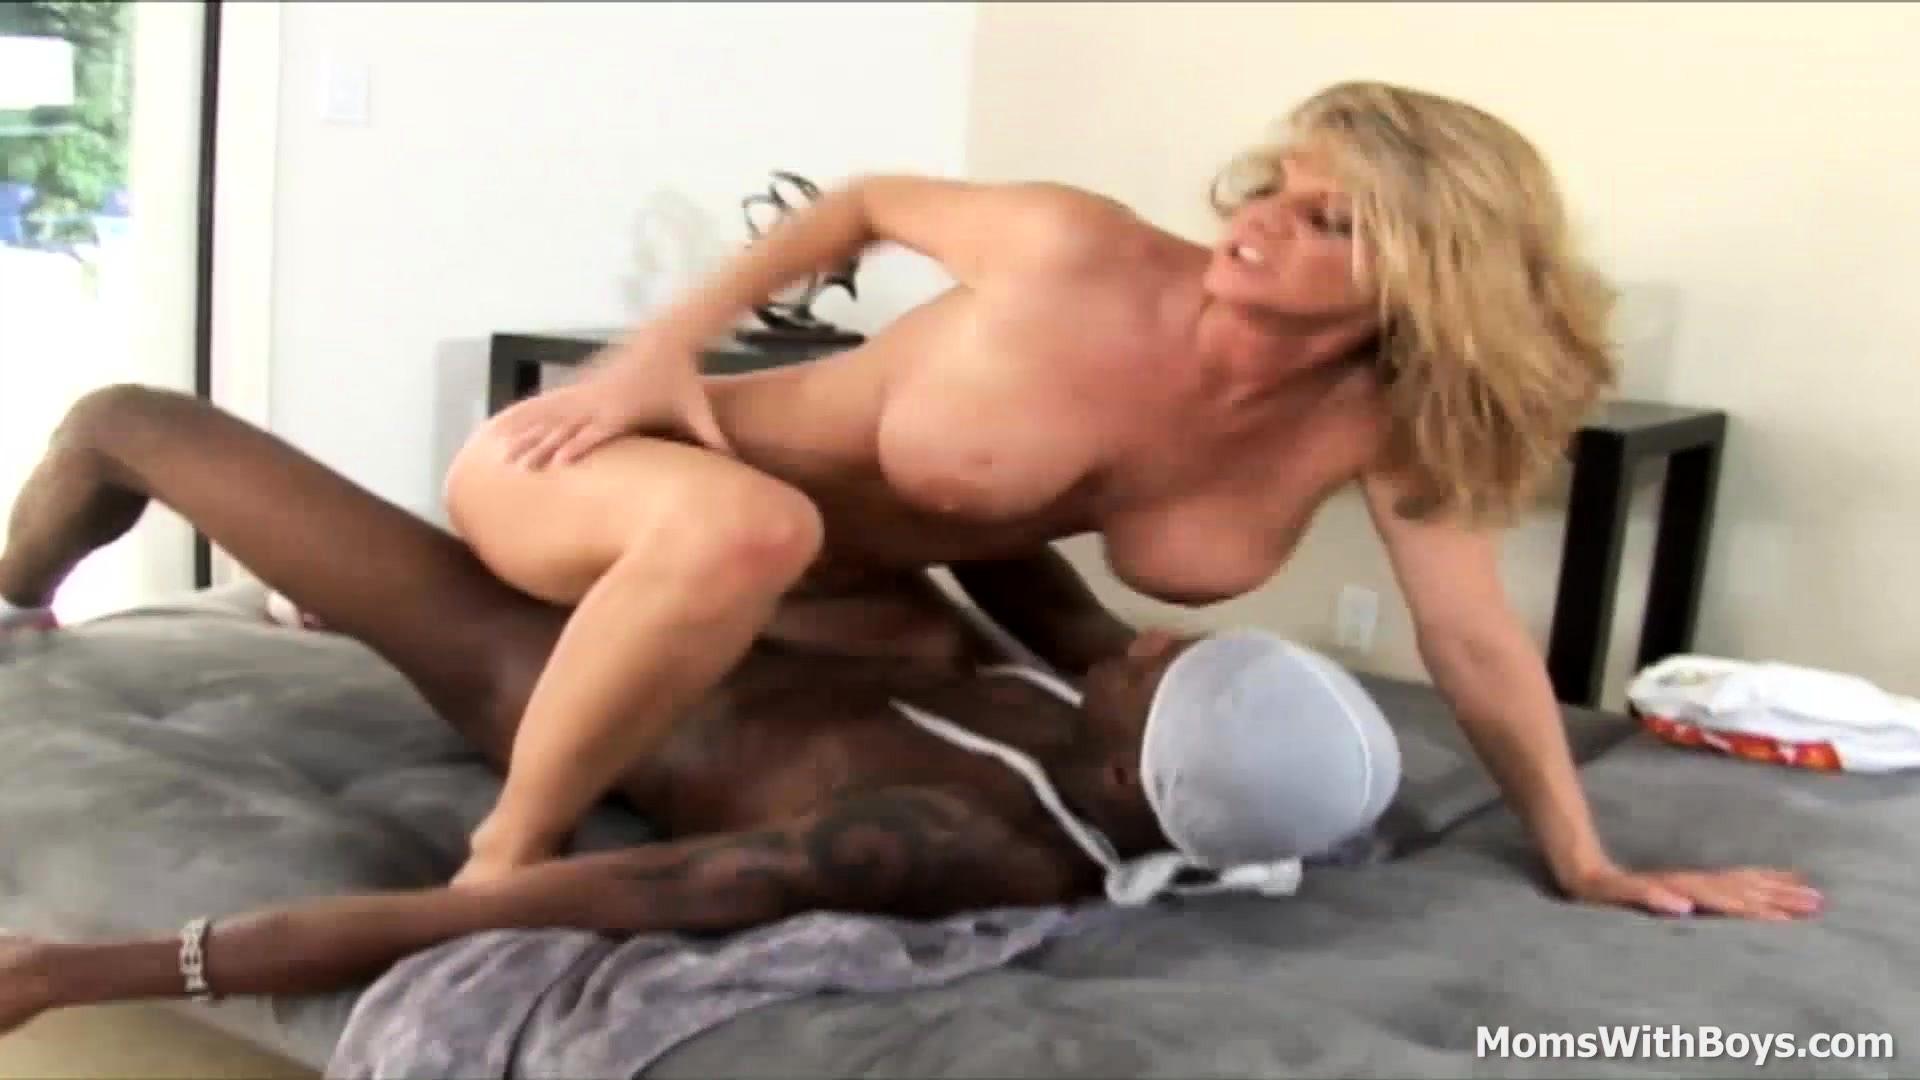 Hot Blonde Milf Fucks Bbc